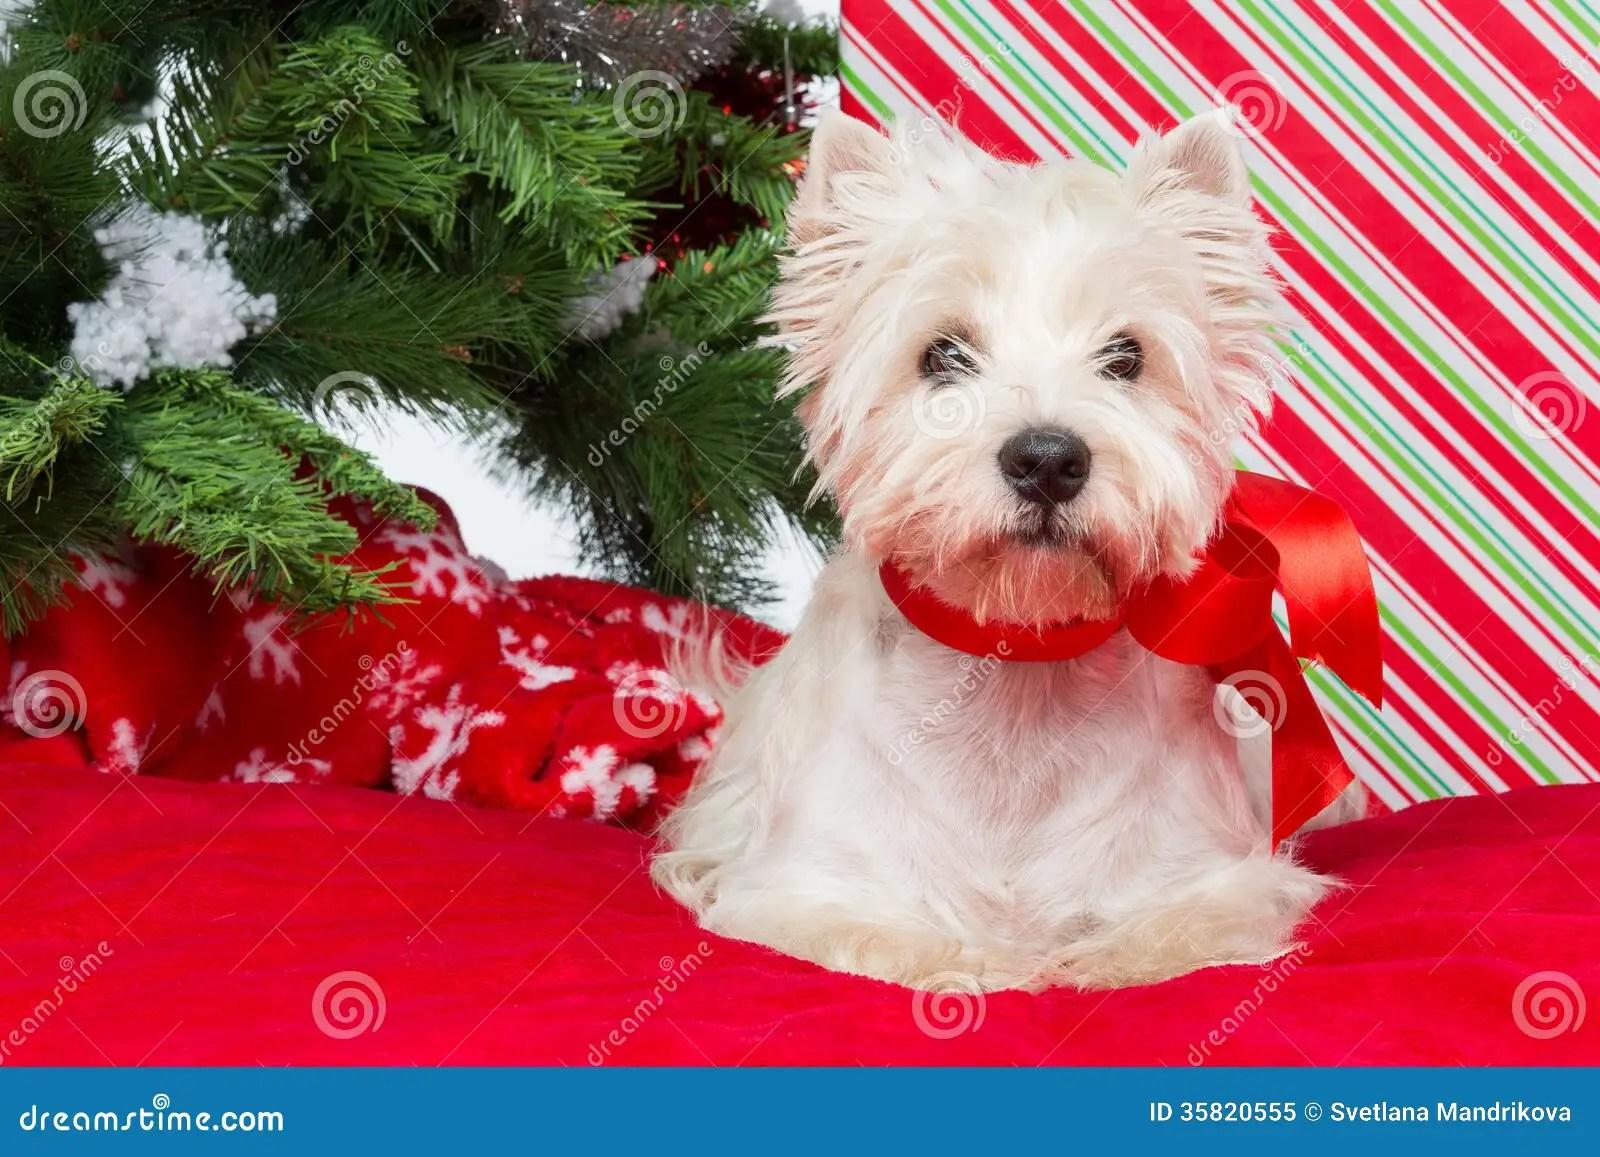 Xmas Cute Wallpaper Westie Under New Year Tree Royalty Free Stock Photo